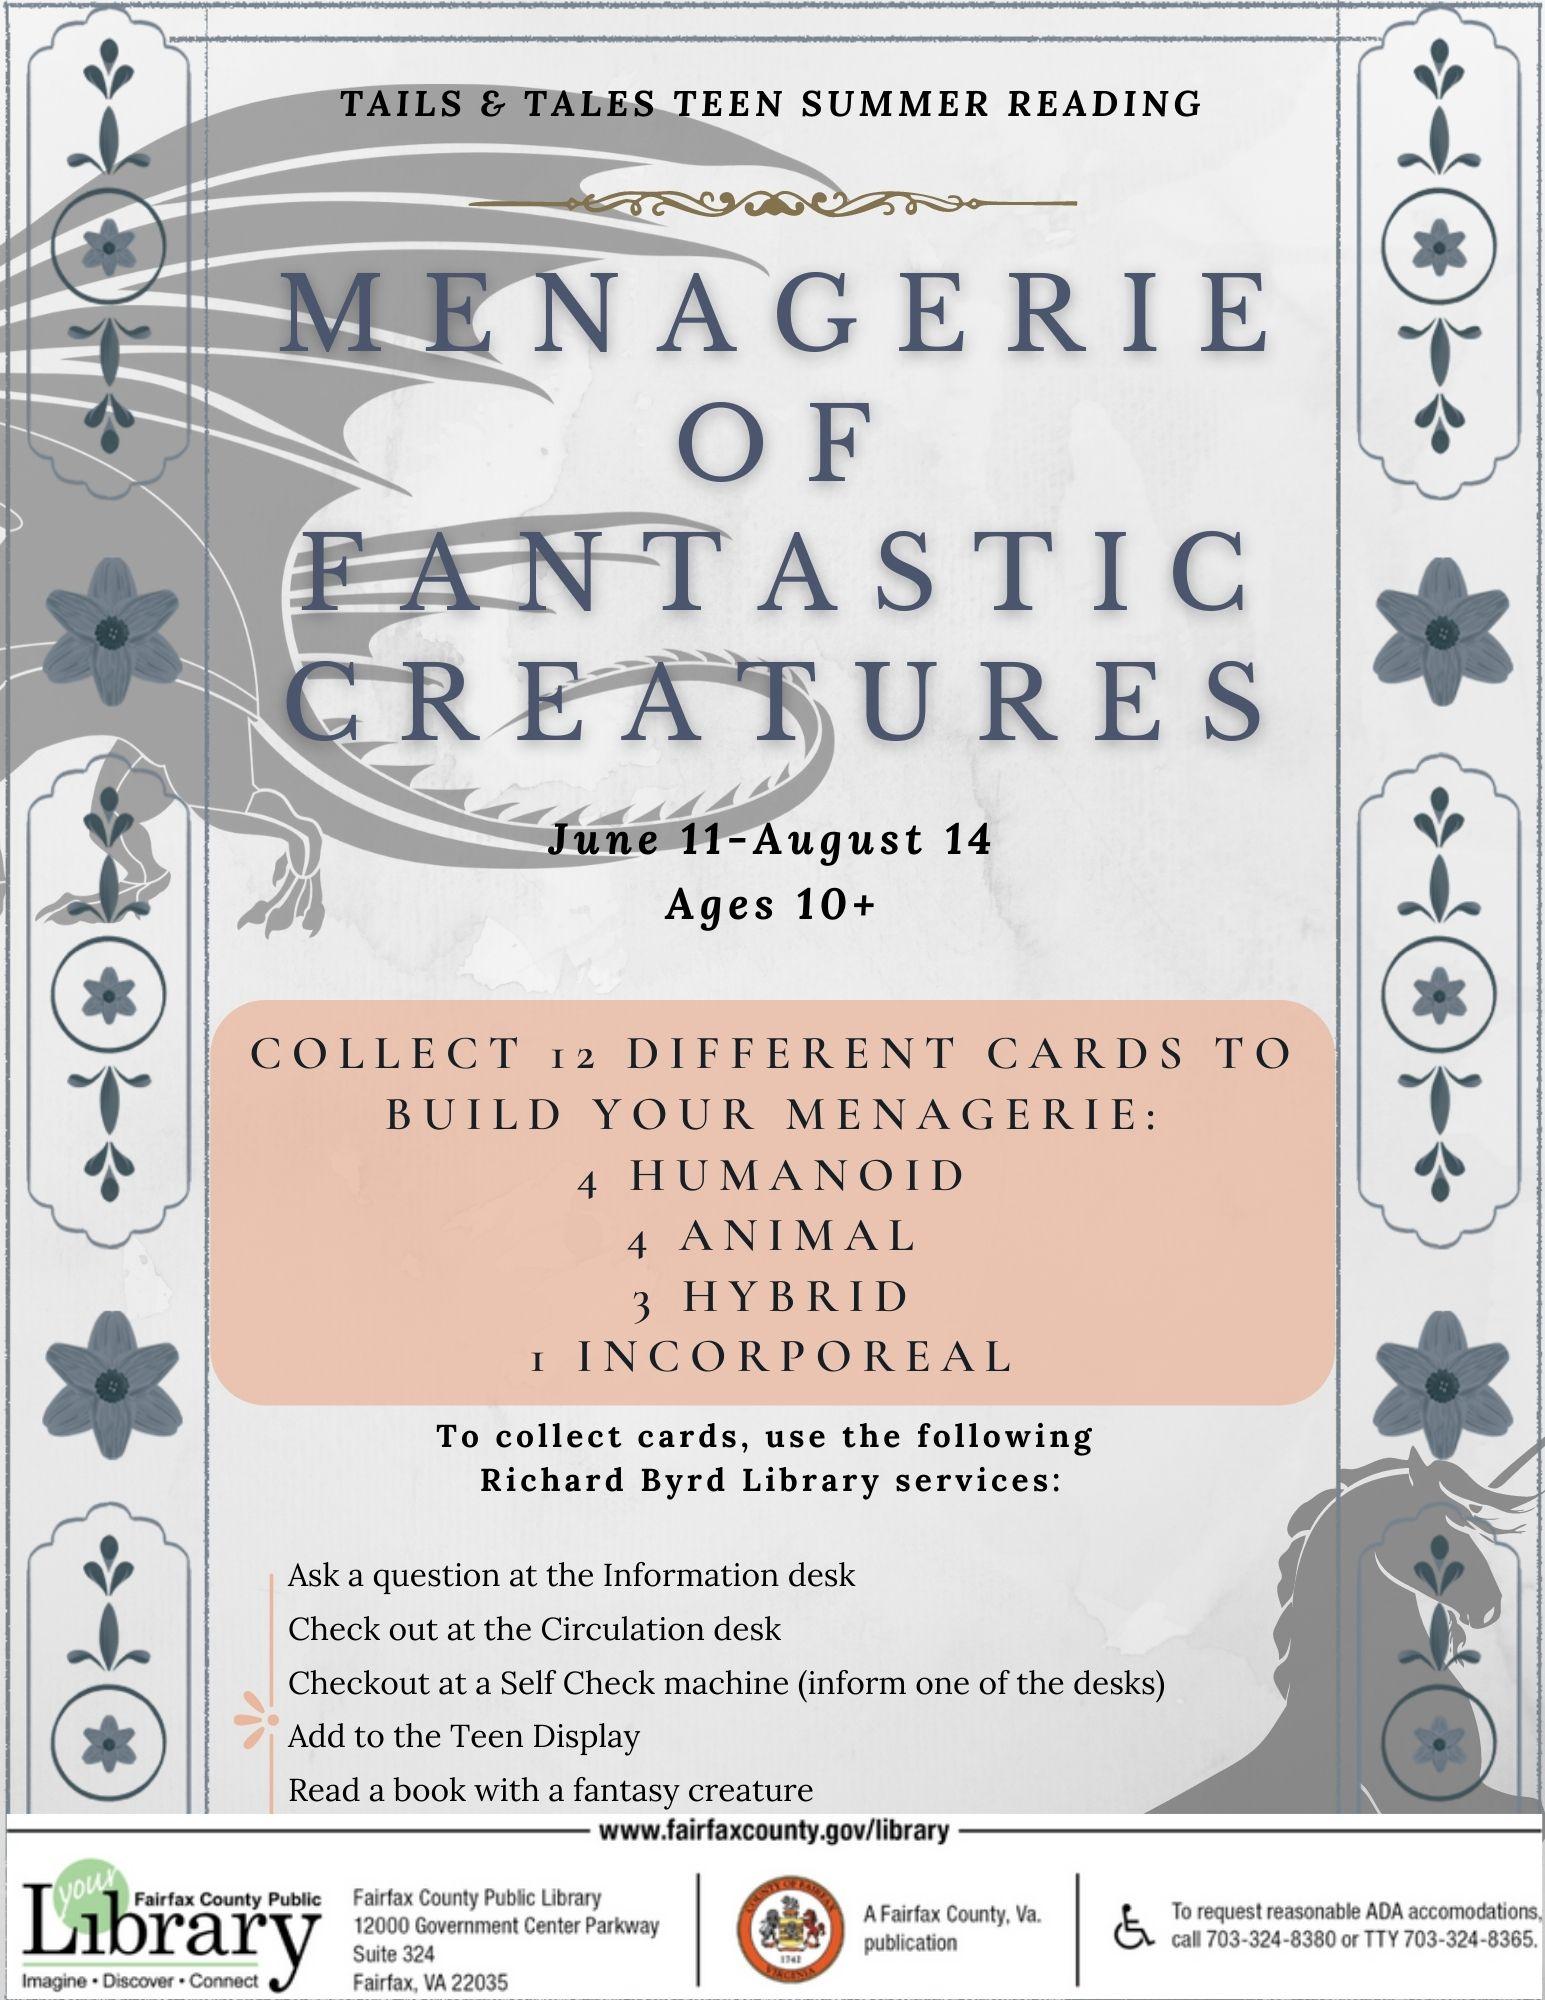 Menagerie of Fantastic Creatures for Teens & Tweens